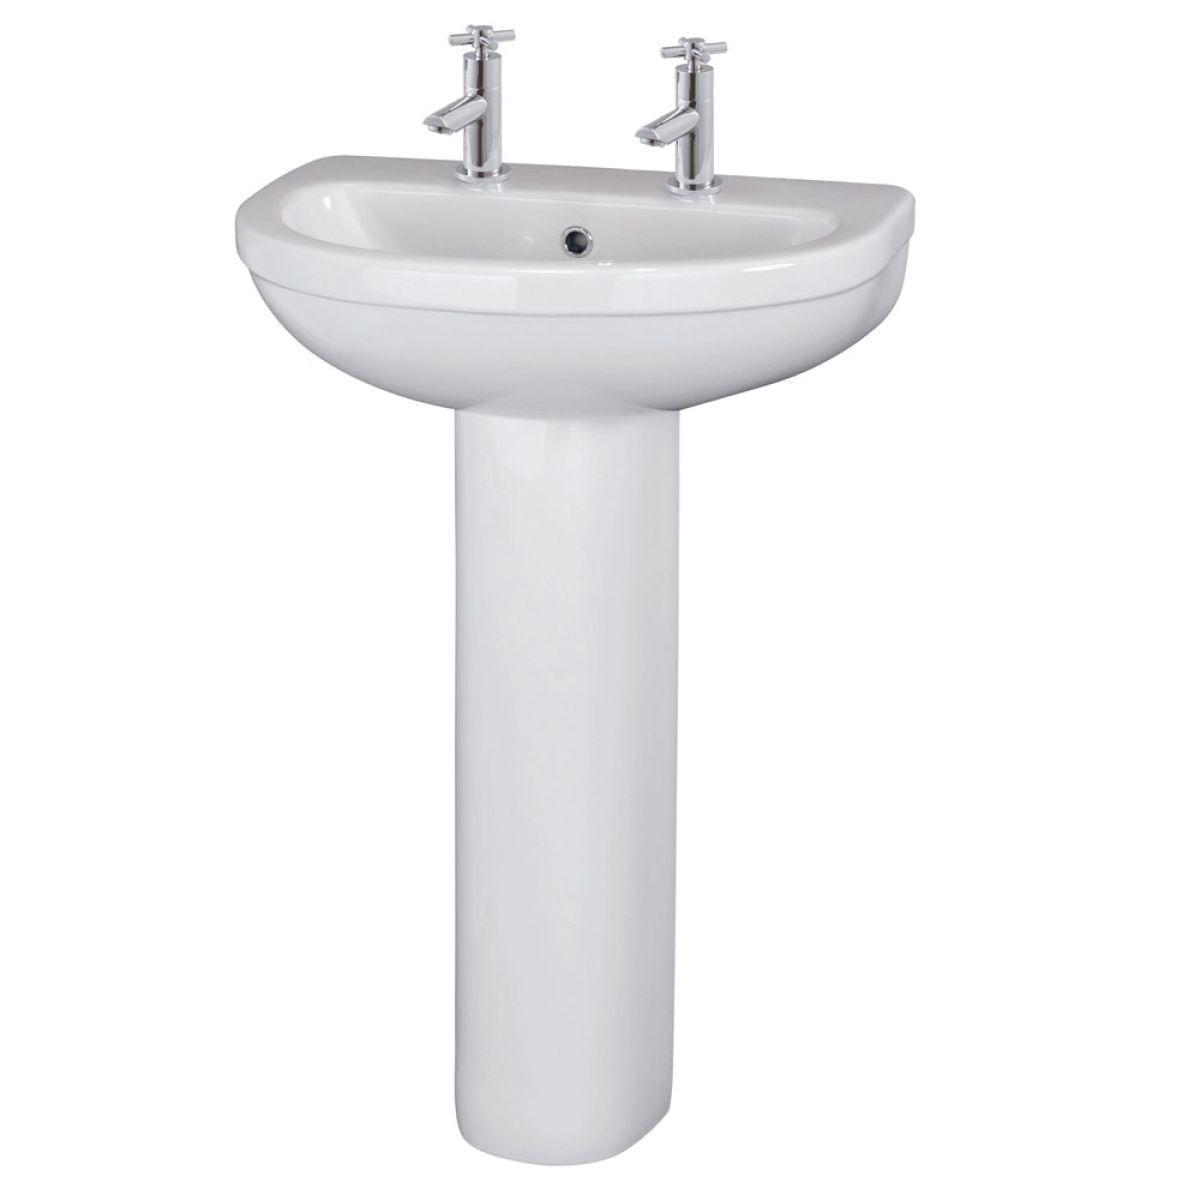 Premier Ivo Basin with Pedestal 550mm - 1 Tap Hole